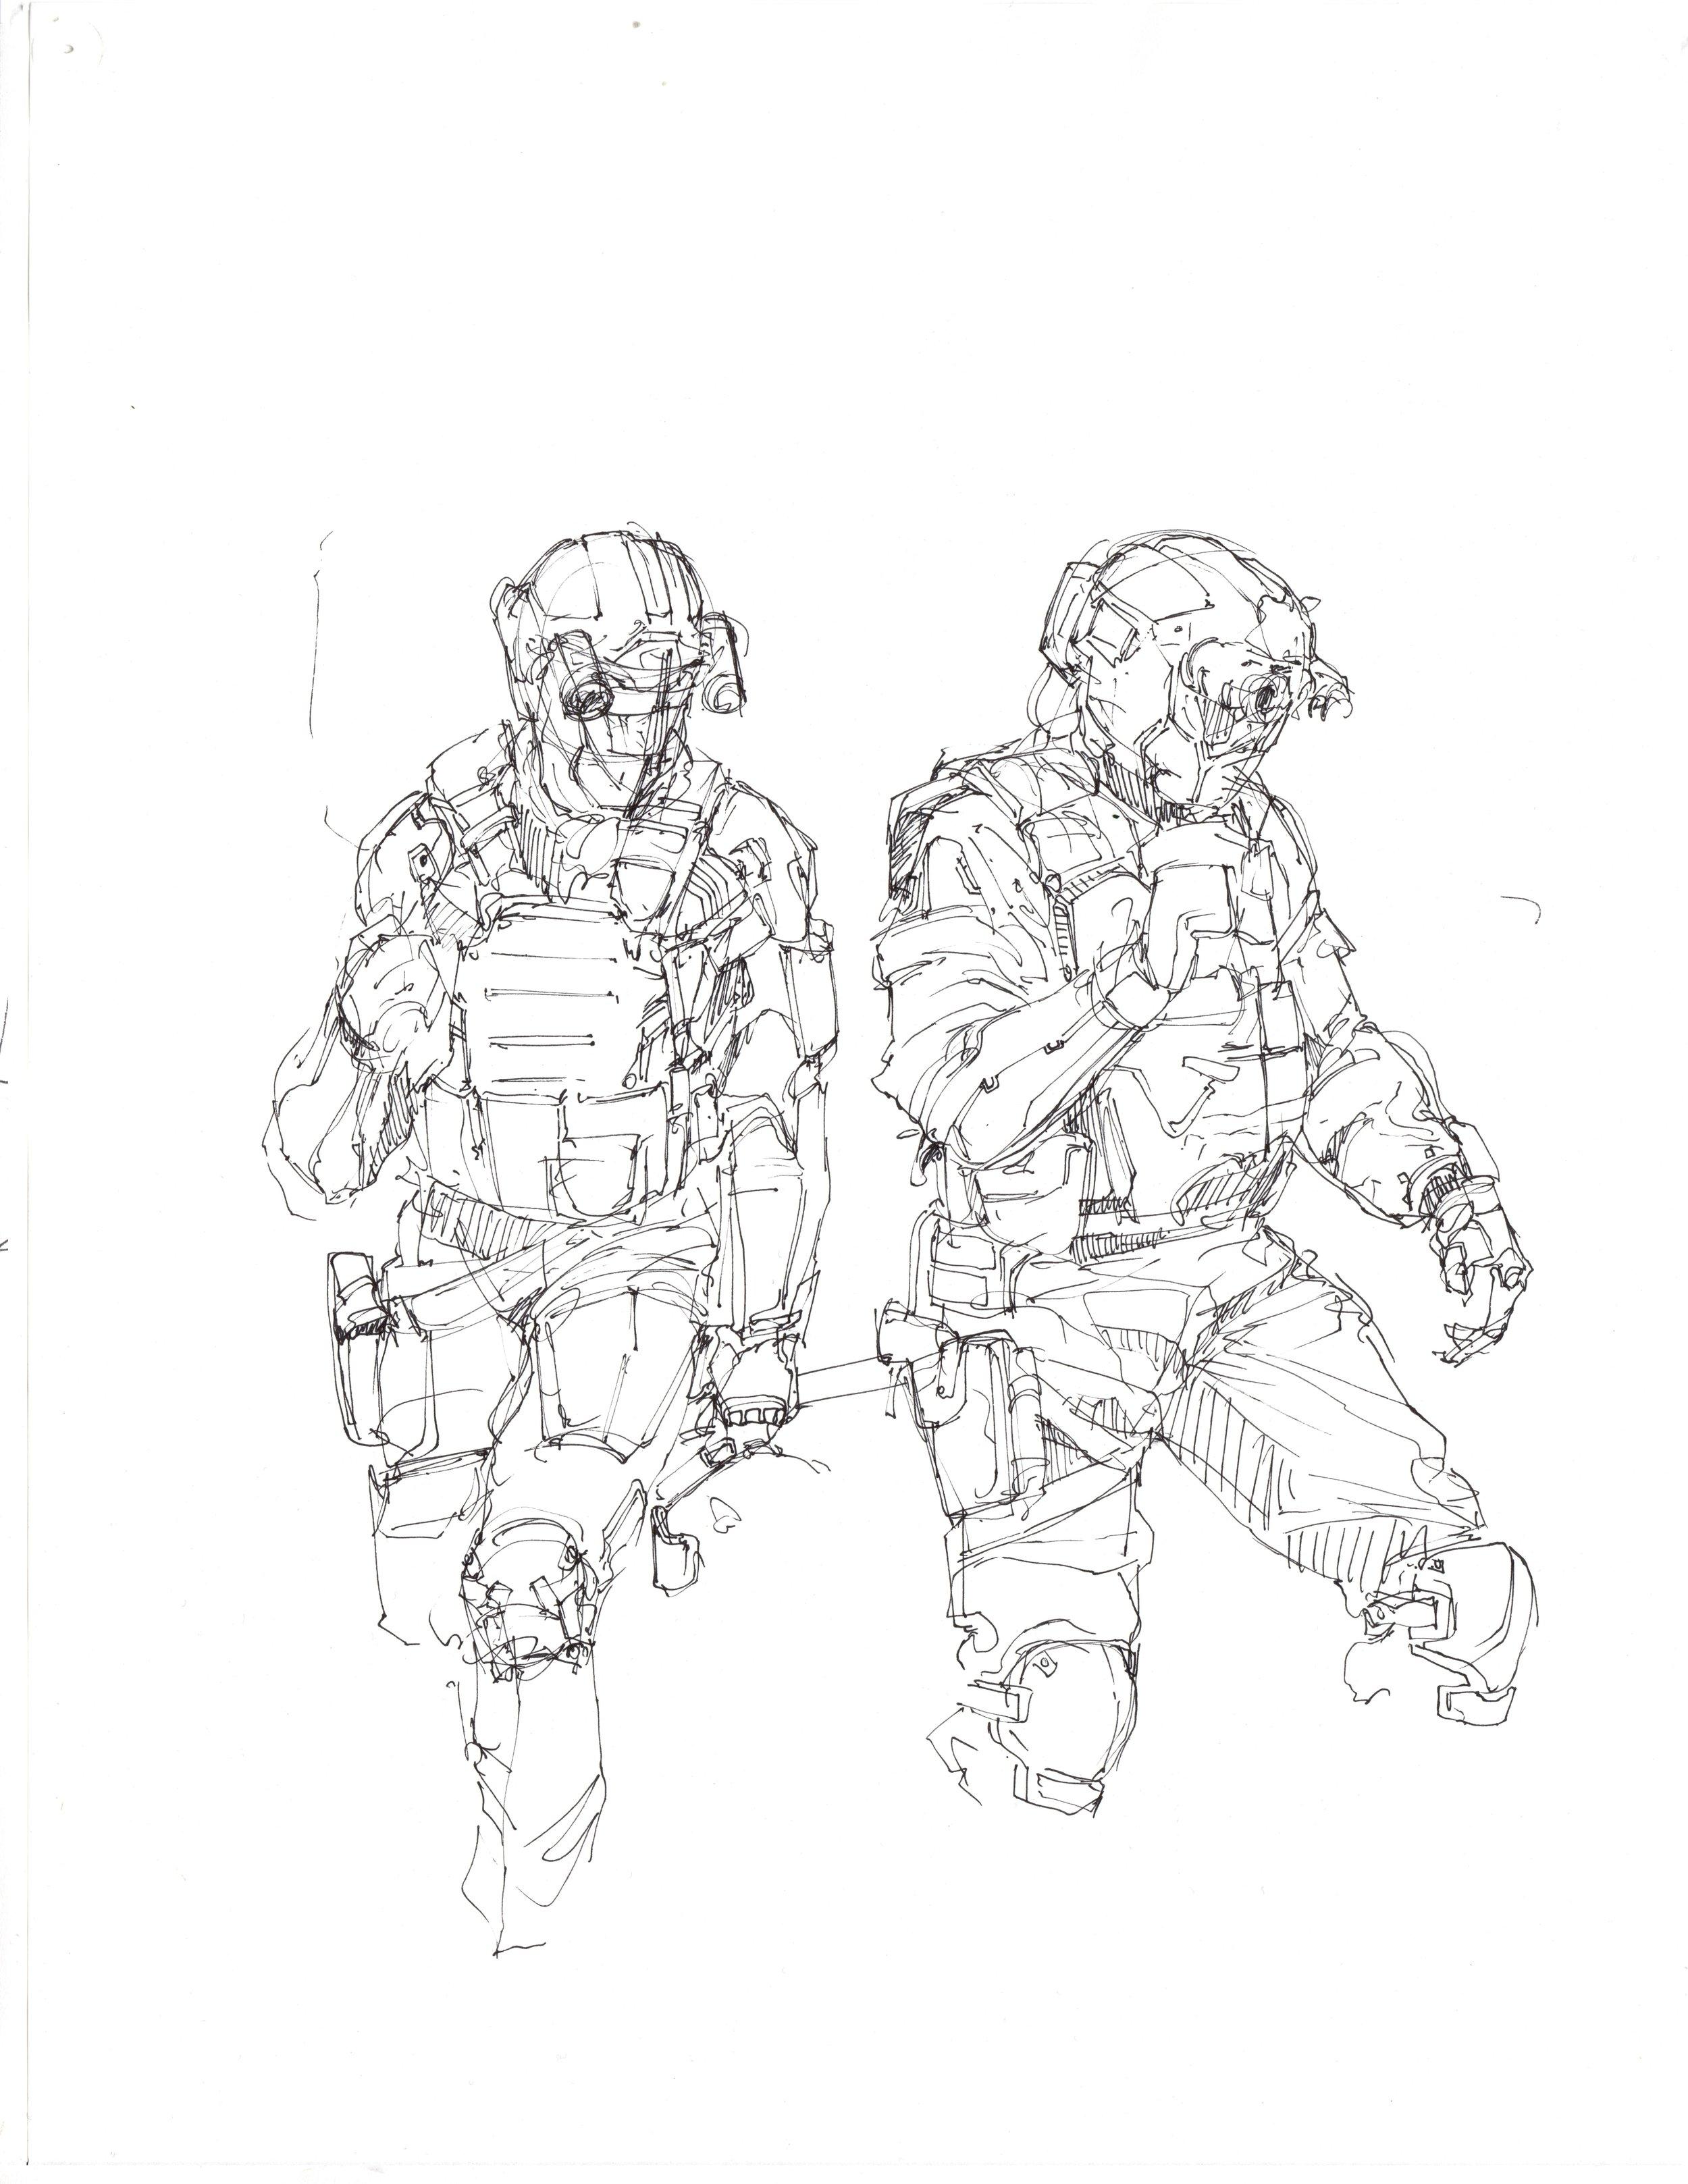 CH_001_Soldiers.jpg